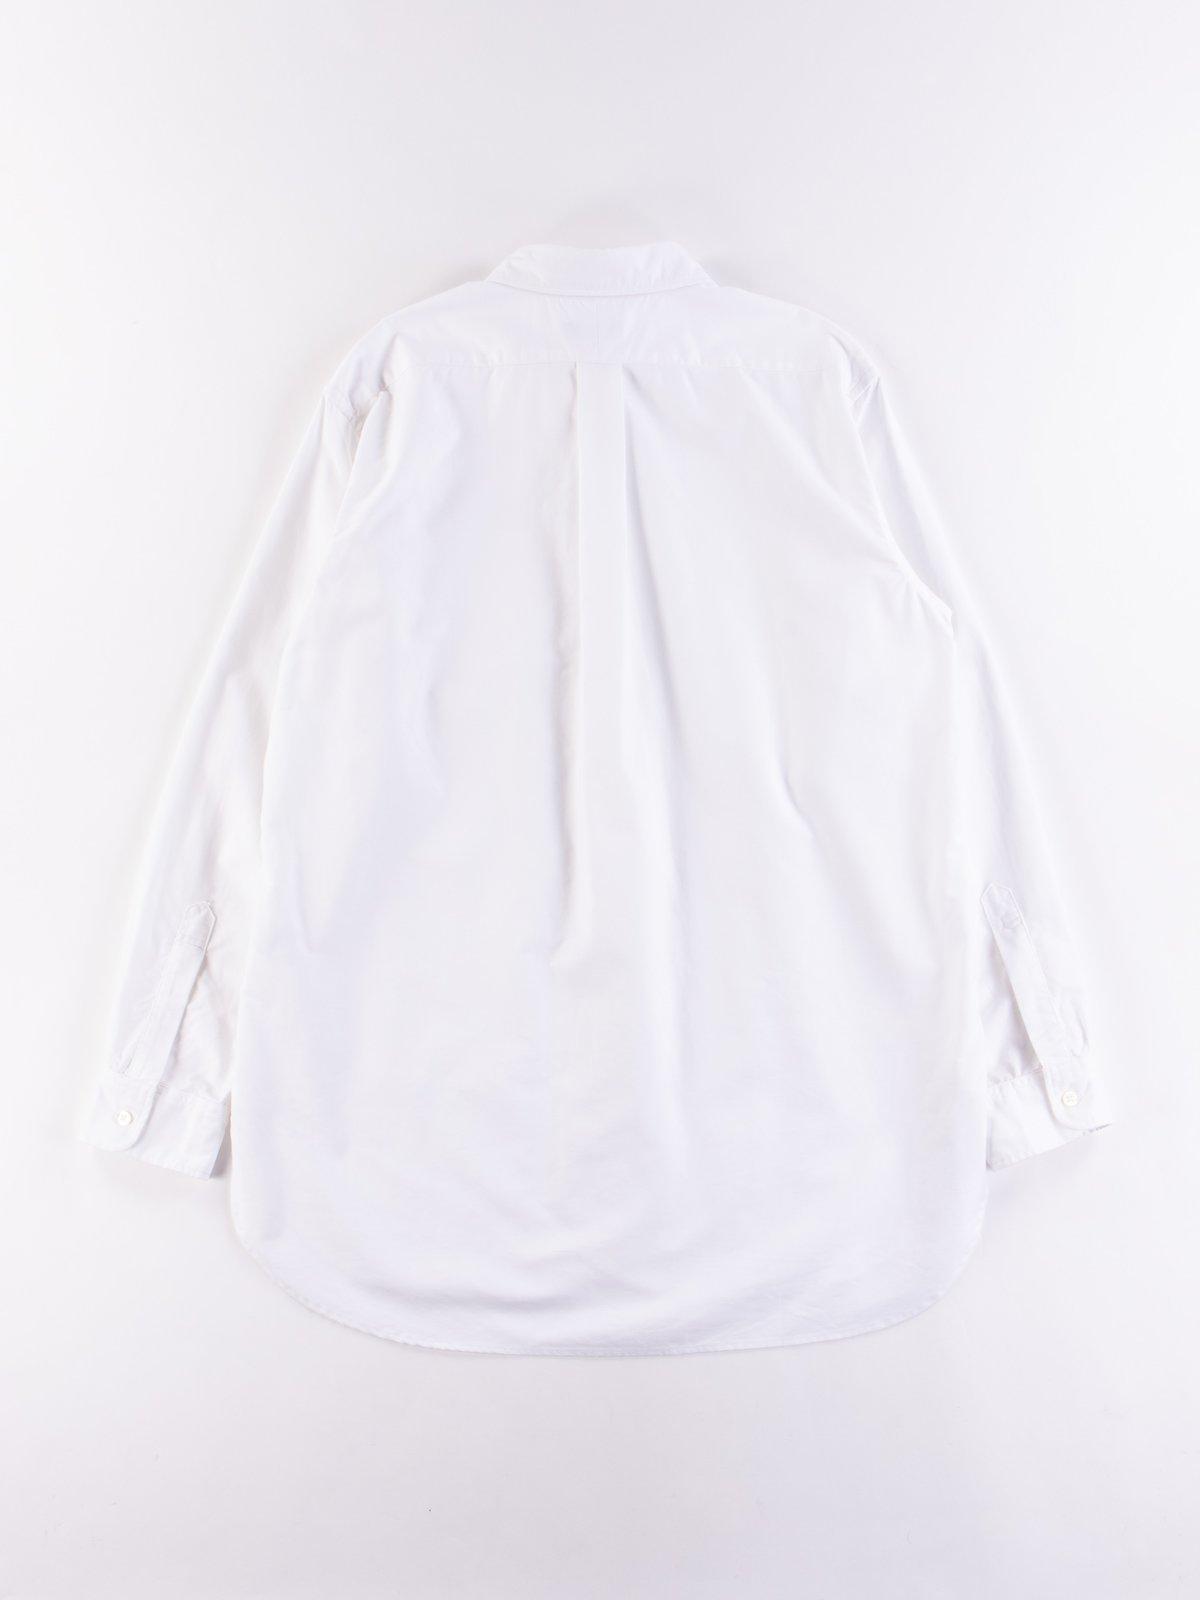 White Cotton Oxford 19th Century BD Shirt - Image 5